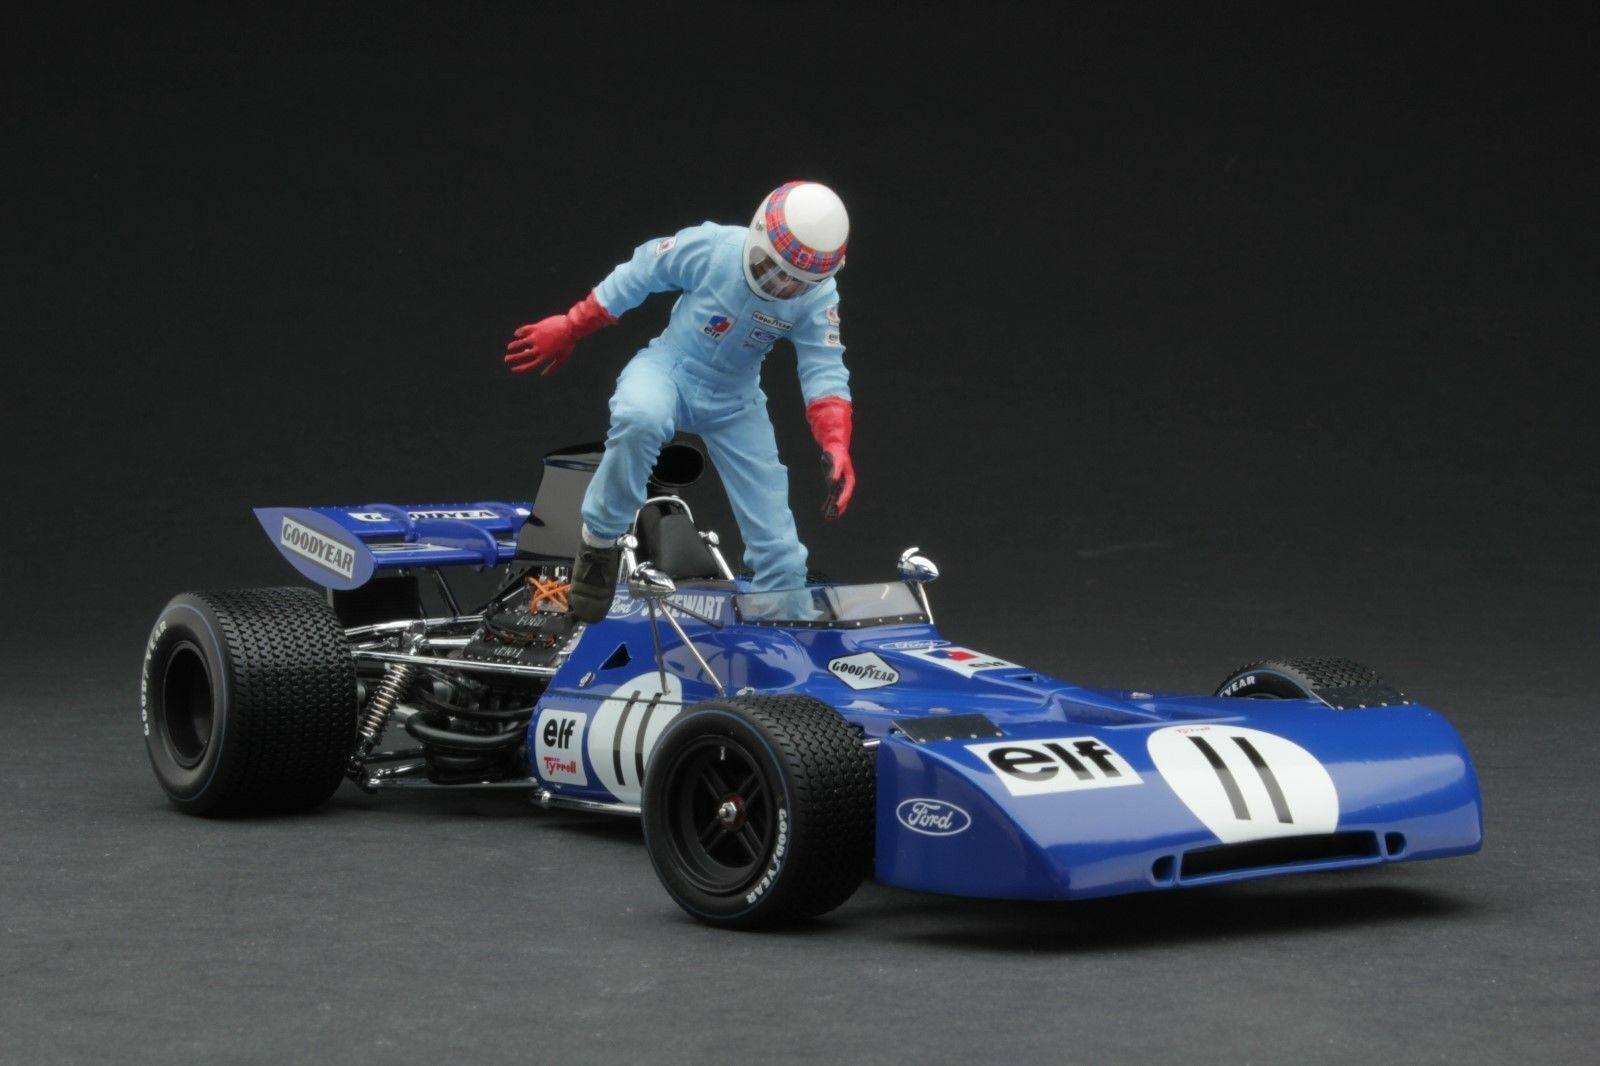 Exoto Ford Tyrrell 003 F1 Coche Carreras 1 18 Jackie Stewart 1971 Canadian Gp